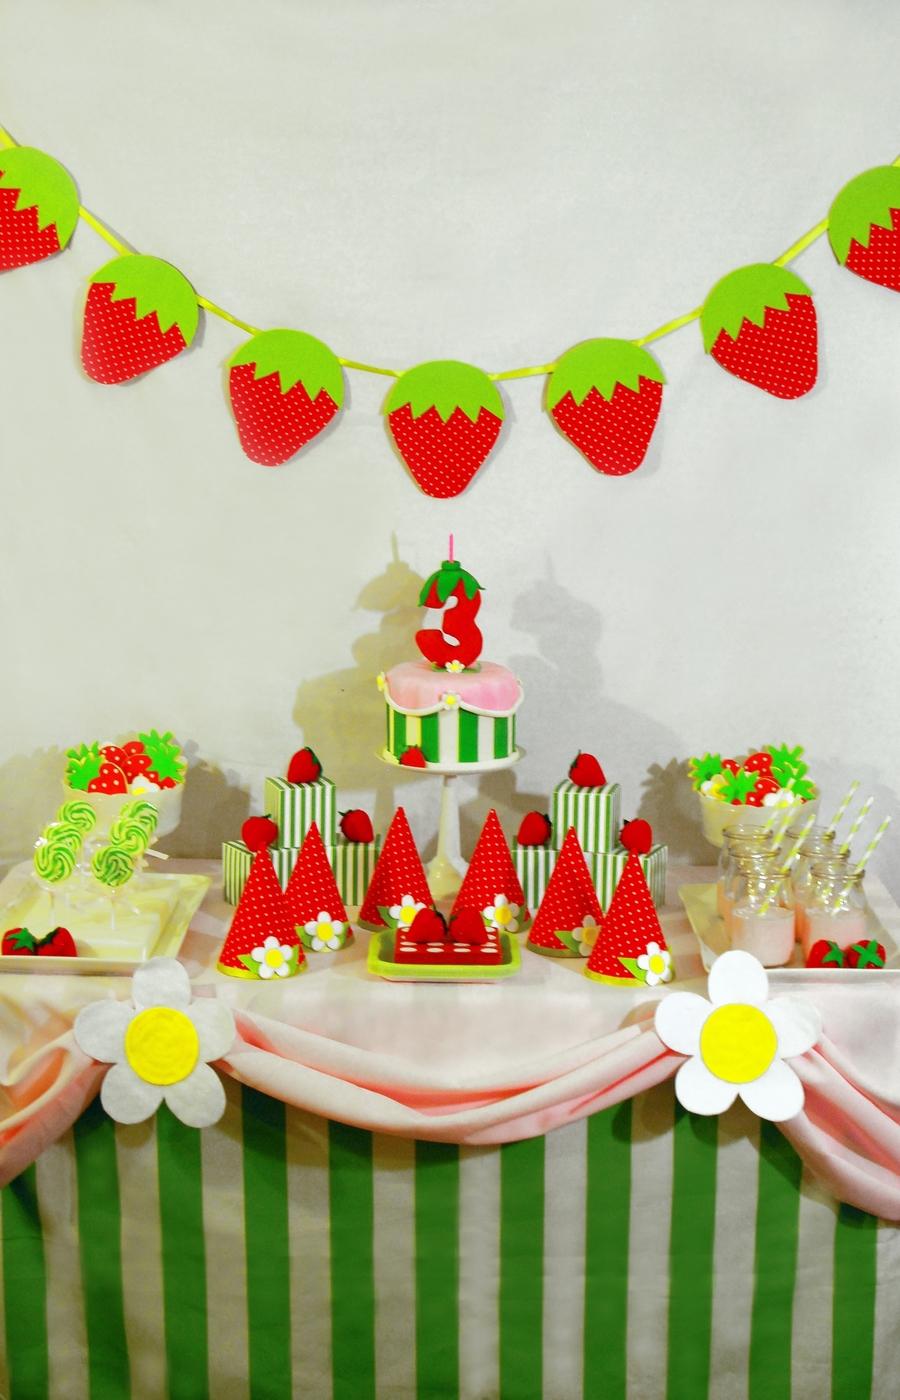 Strawberry Shortcake Birthday Cake And Dessert Table ...